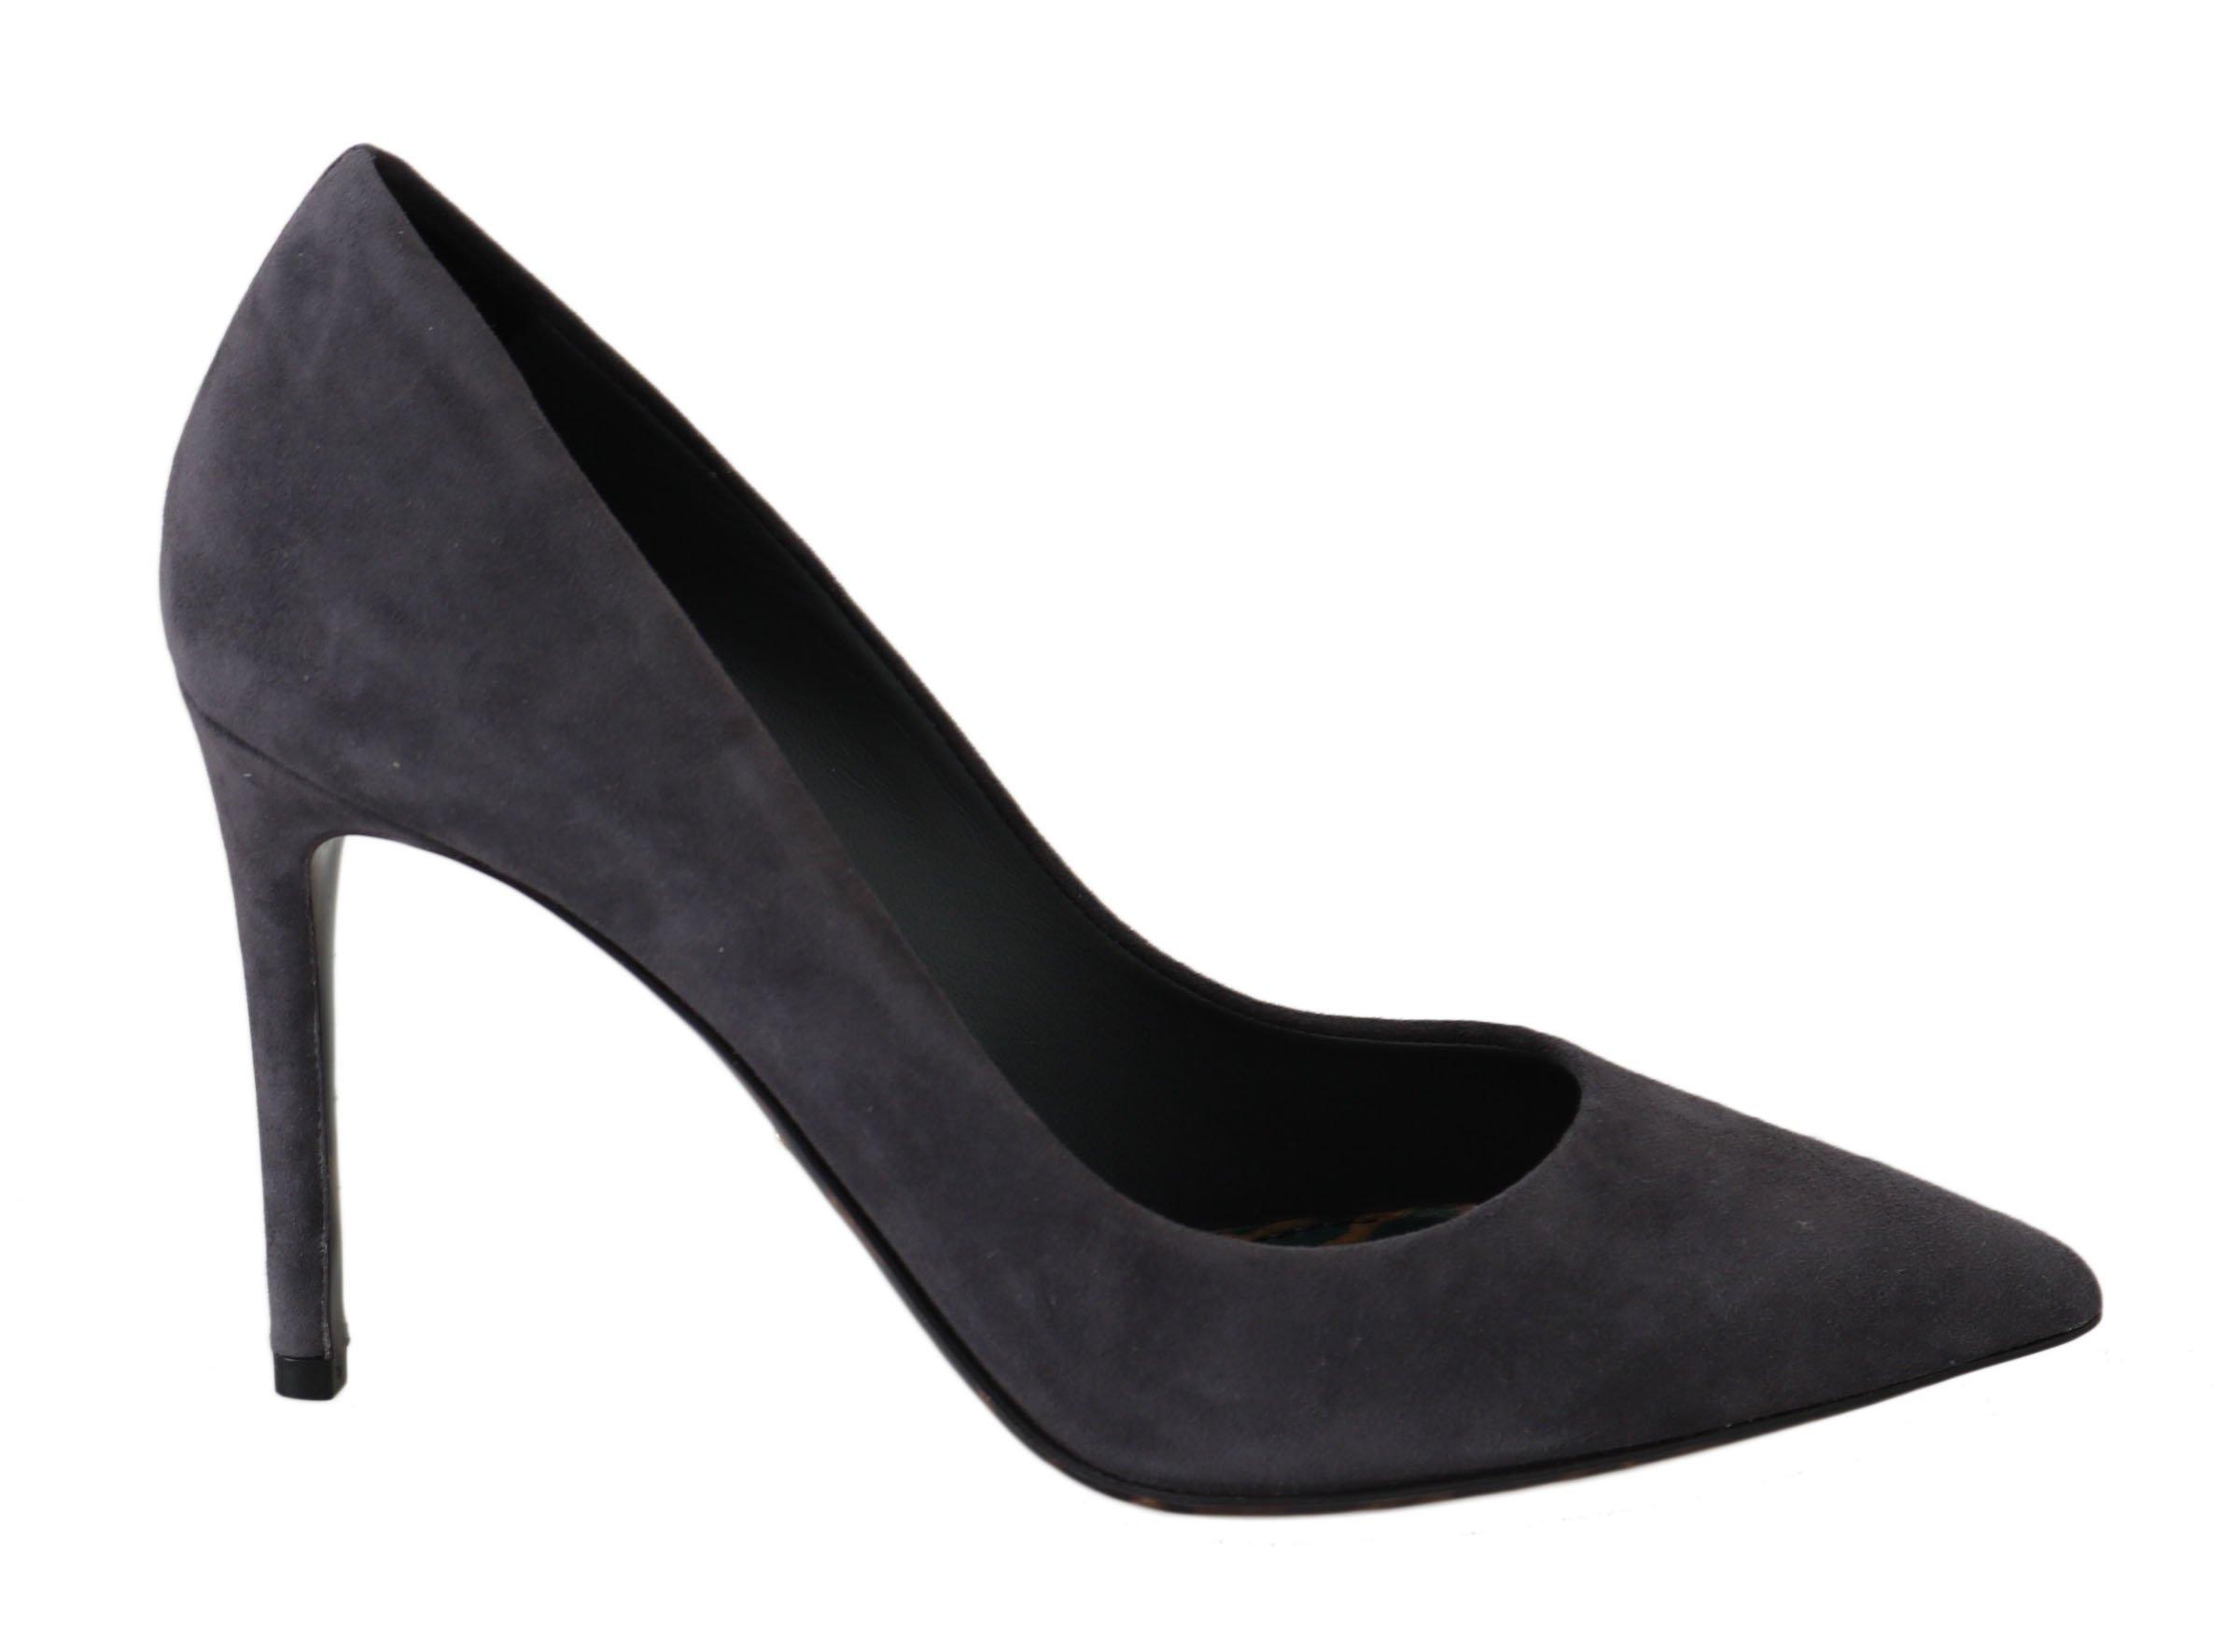 Dolce & Gabbana Women's Suede Leather Stiletto Heels Gray LA5980 - EU35/US4.5